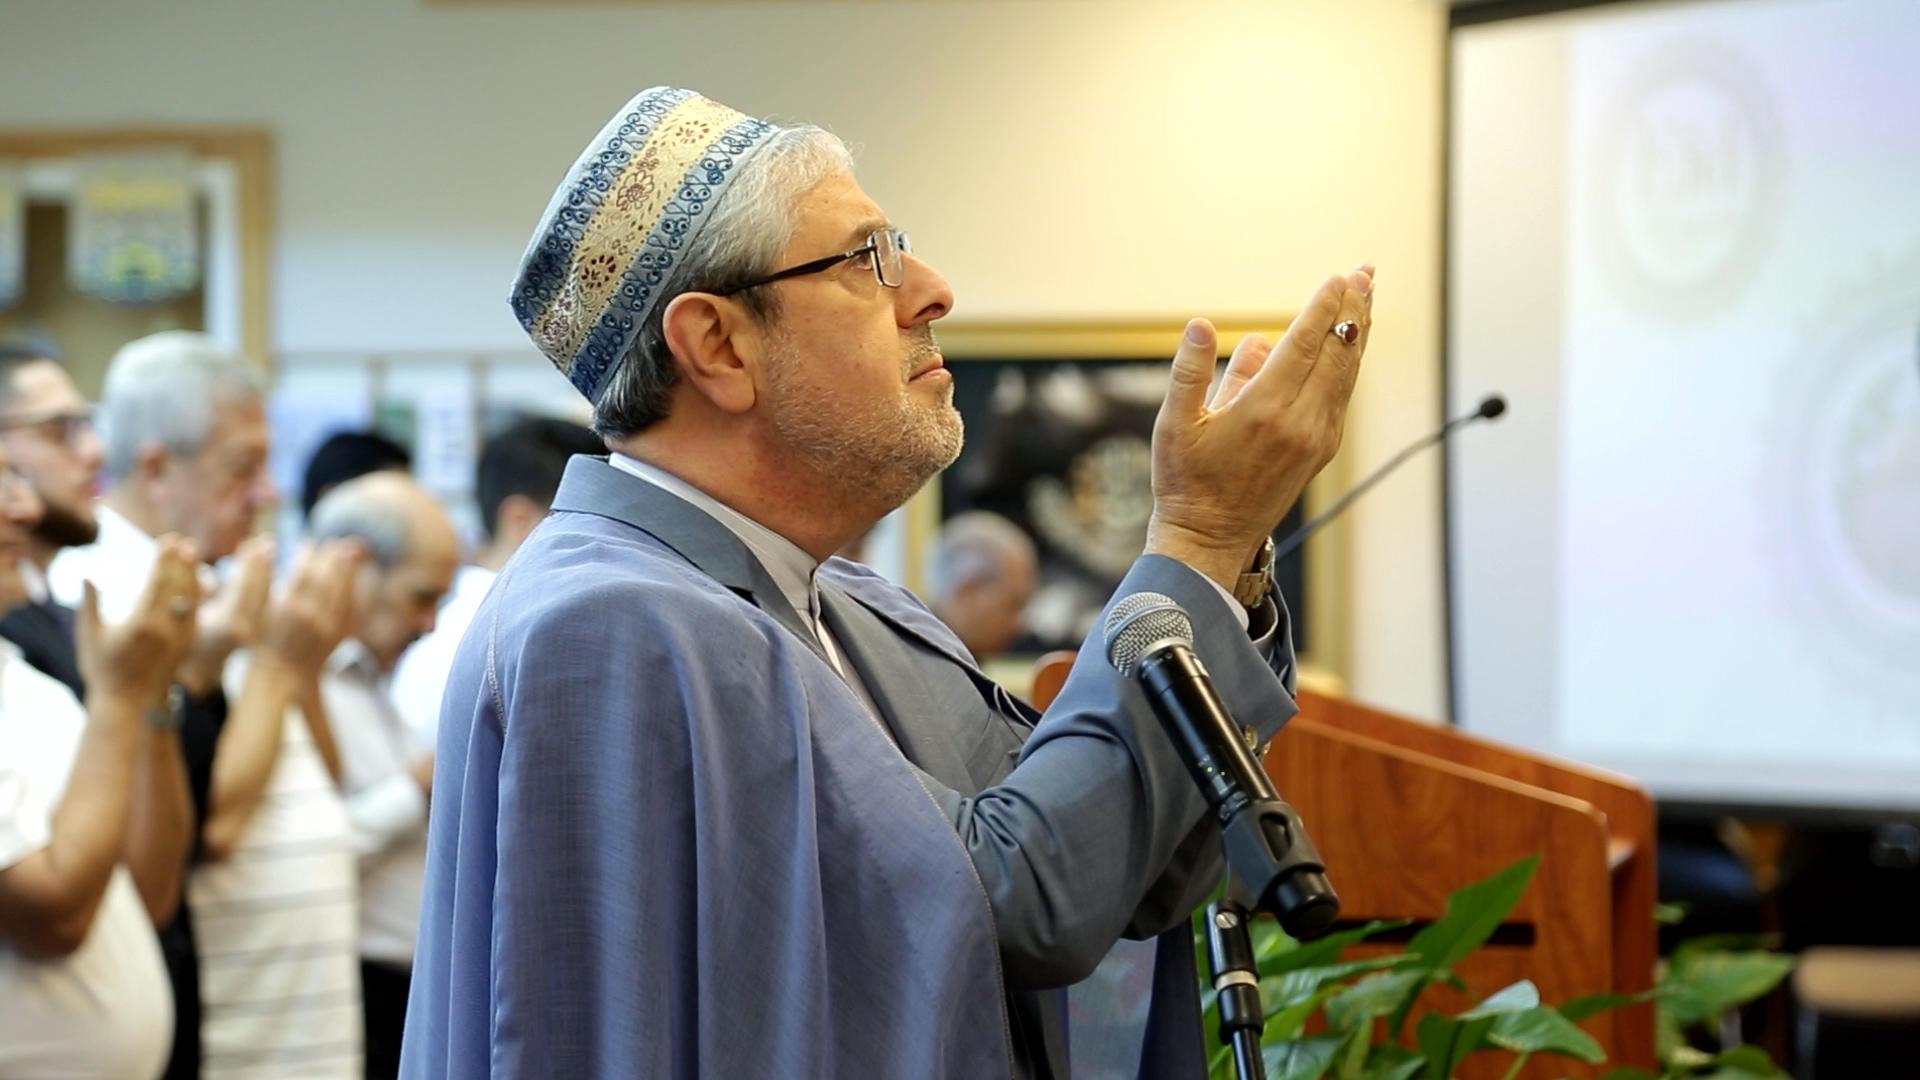 Photo of Imam Seyed Ali Ghazvini leading a prayer